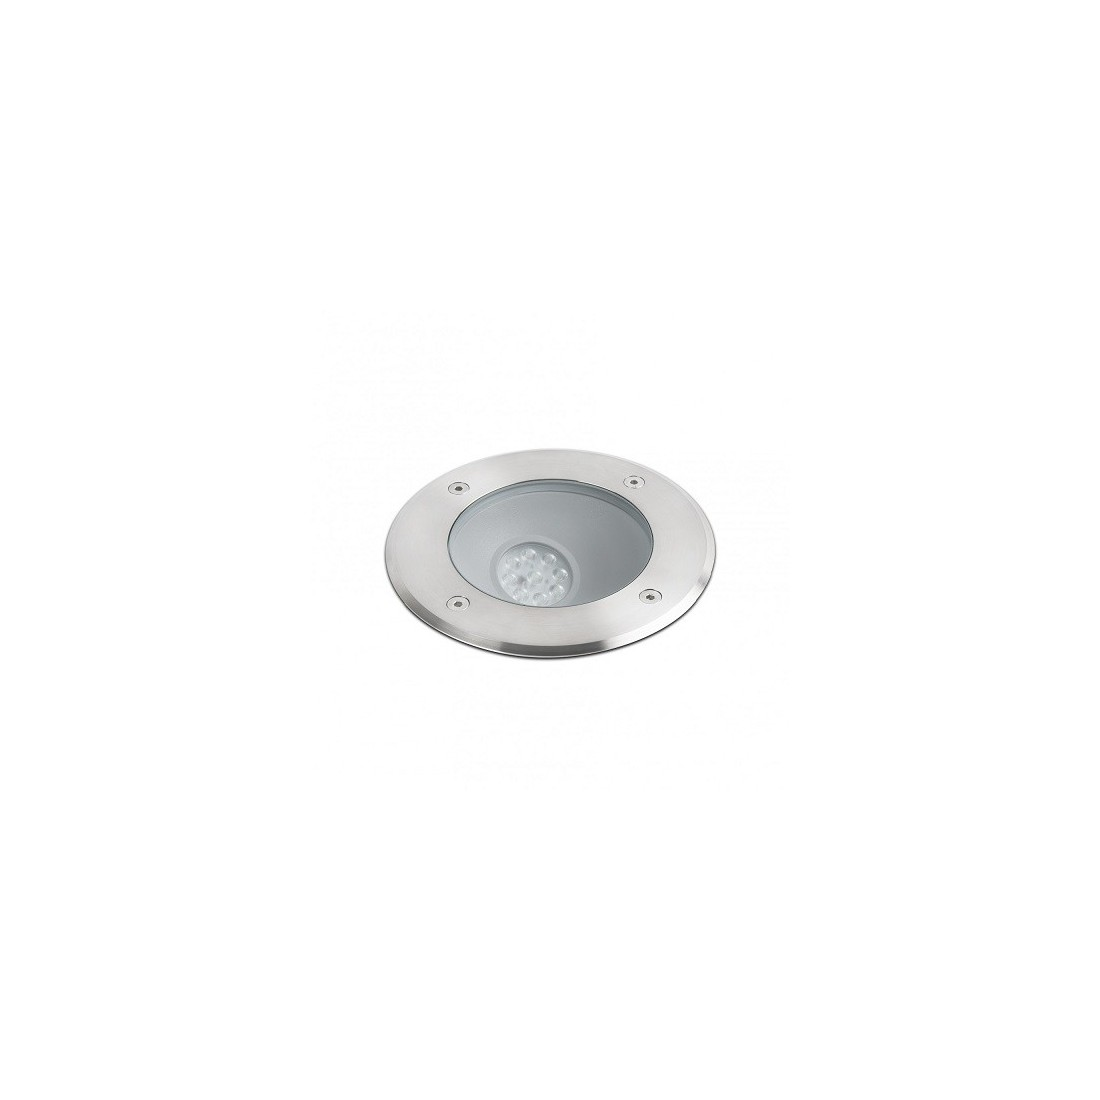 Lamparas ventiladores de techo lamparas modernas - Pintar lamparas de techo ...